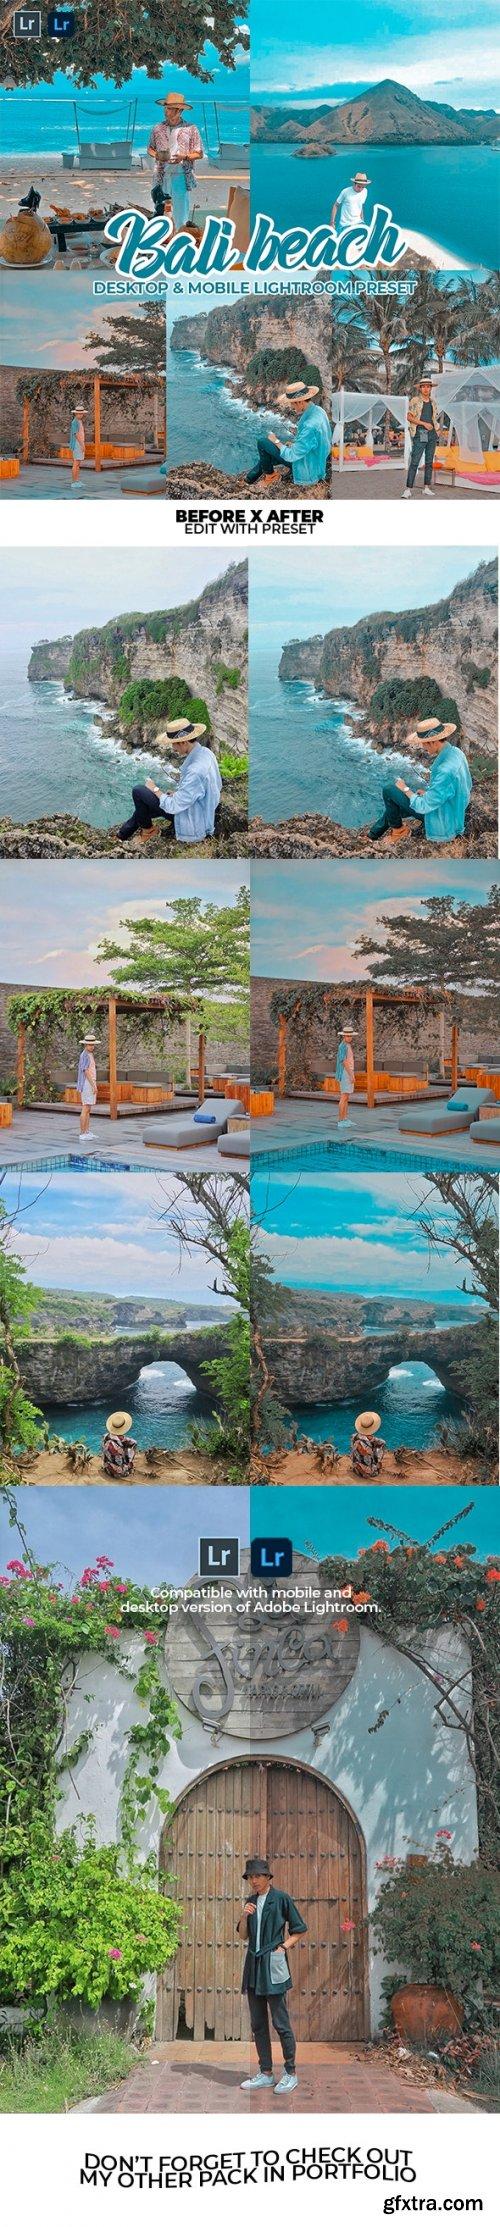 GraphicRiver - Bali Beach Lightroom Preset Dekstop & Mobile 28325876